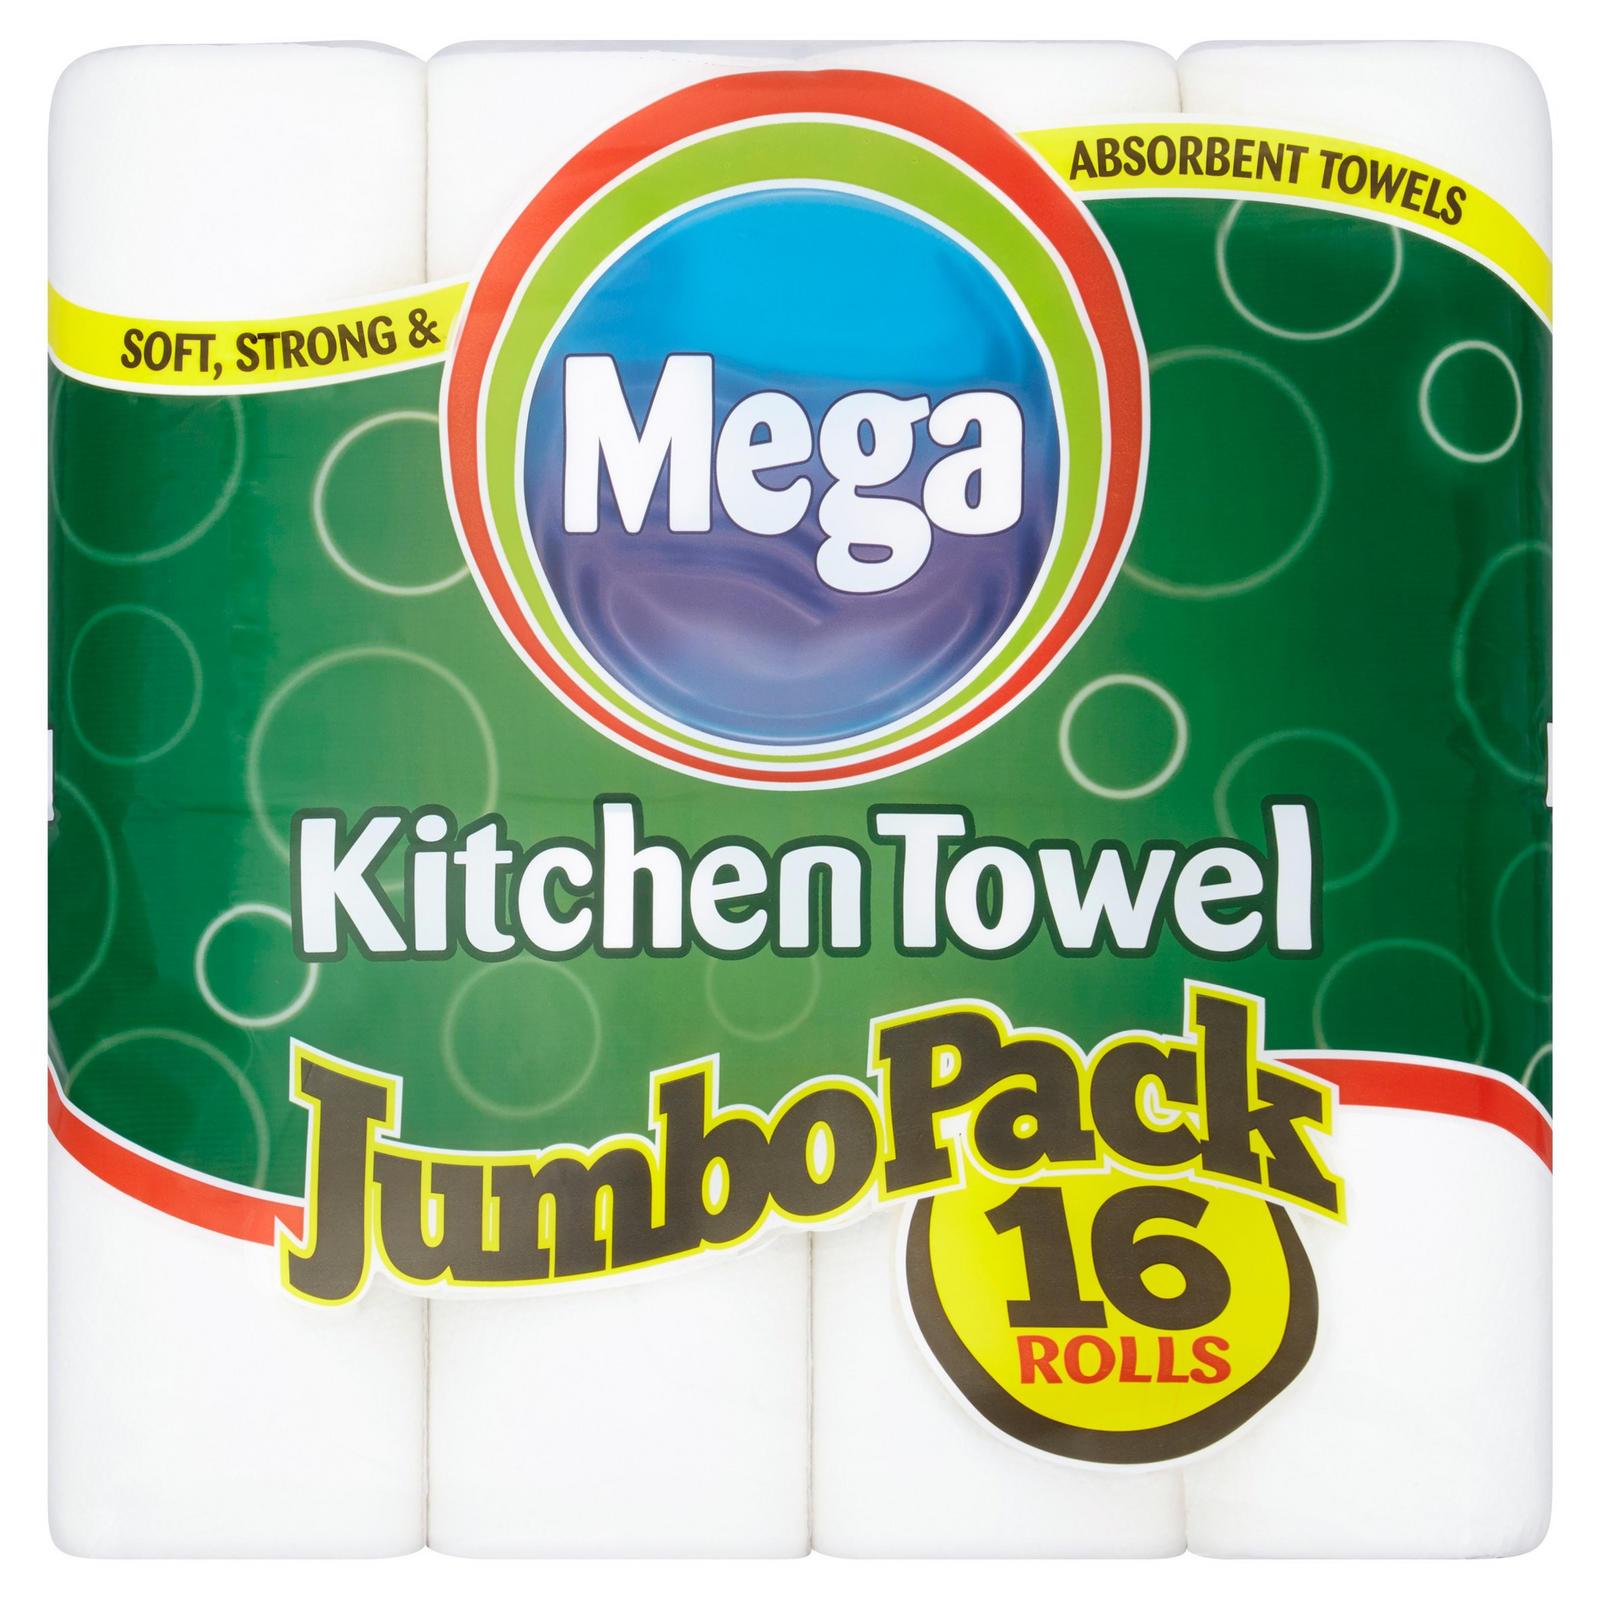 Mega Kitchen Towel Jumbo Pack 16 Rolls Toilet Roll